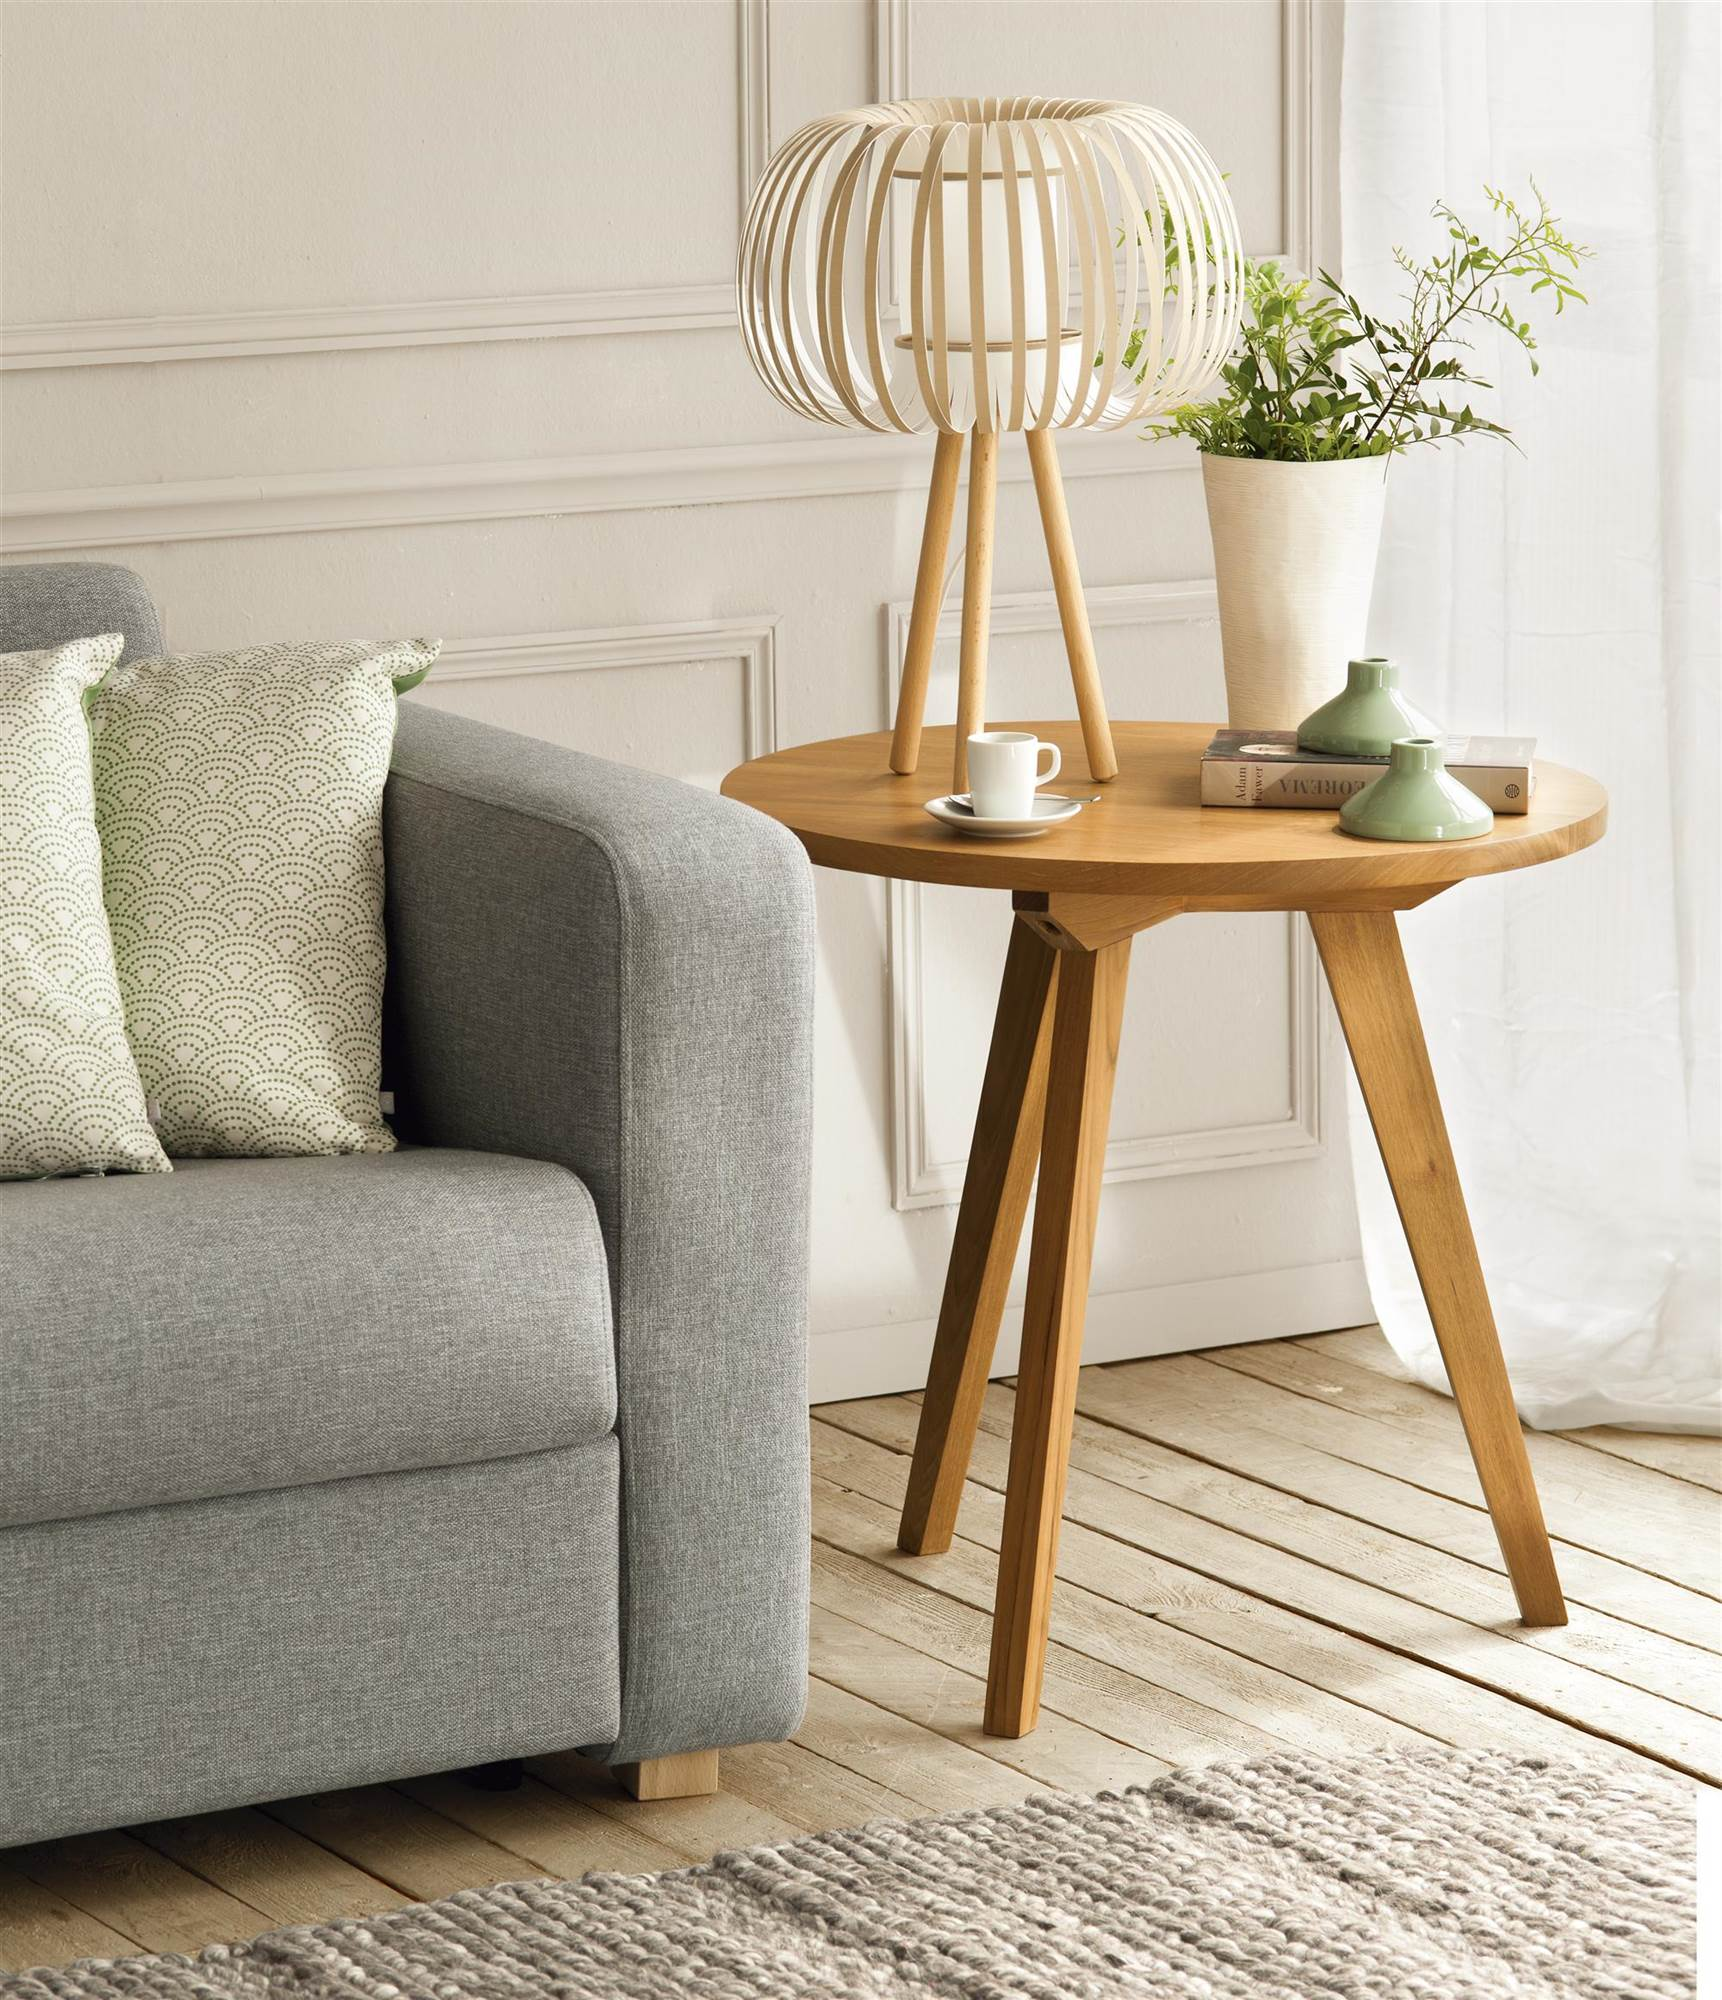 401 fotos de mesas auxiliares - Mesita auxiliar sofa ...